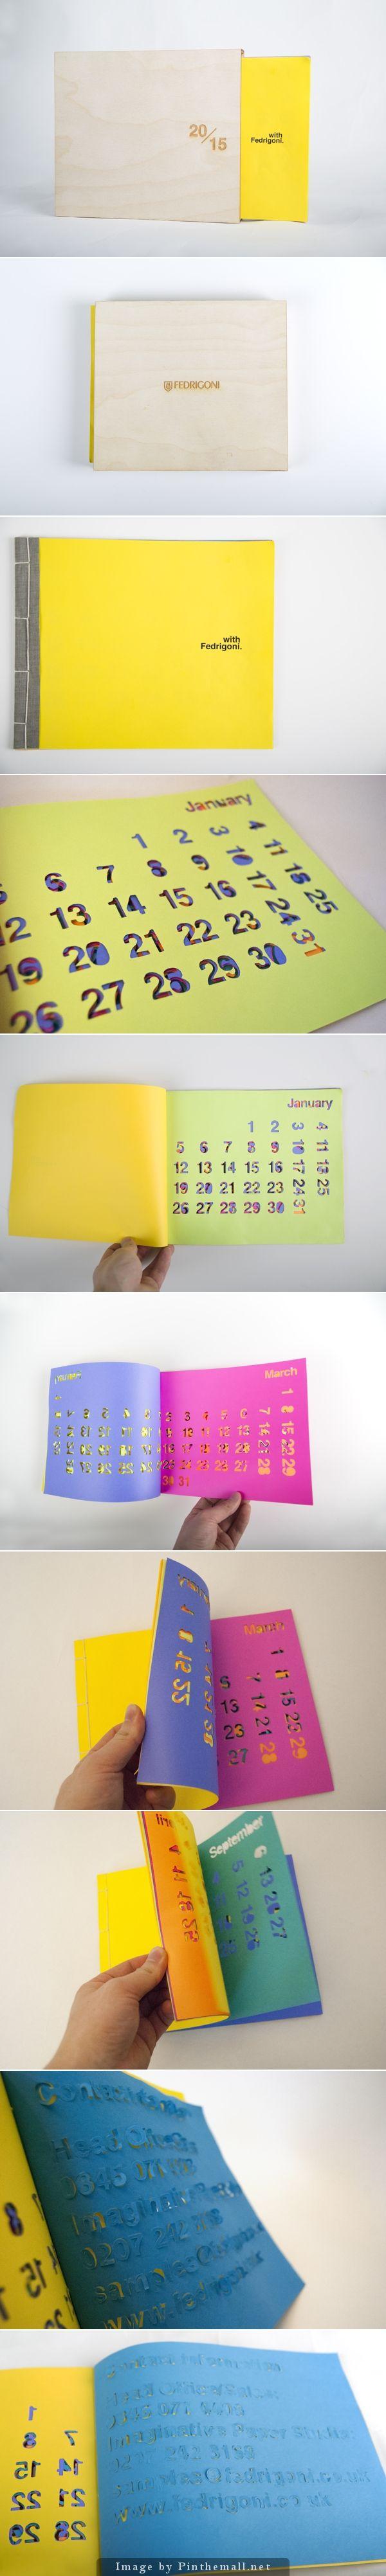 Fedrigoni 2015 Calendar Design YCN Student Awards By Aaron Fan Feng